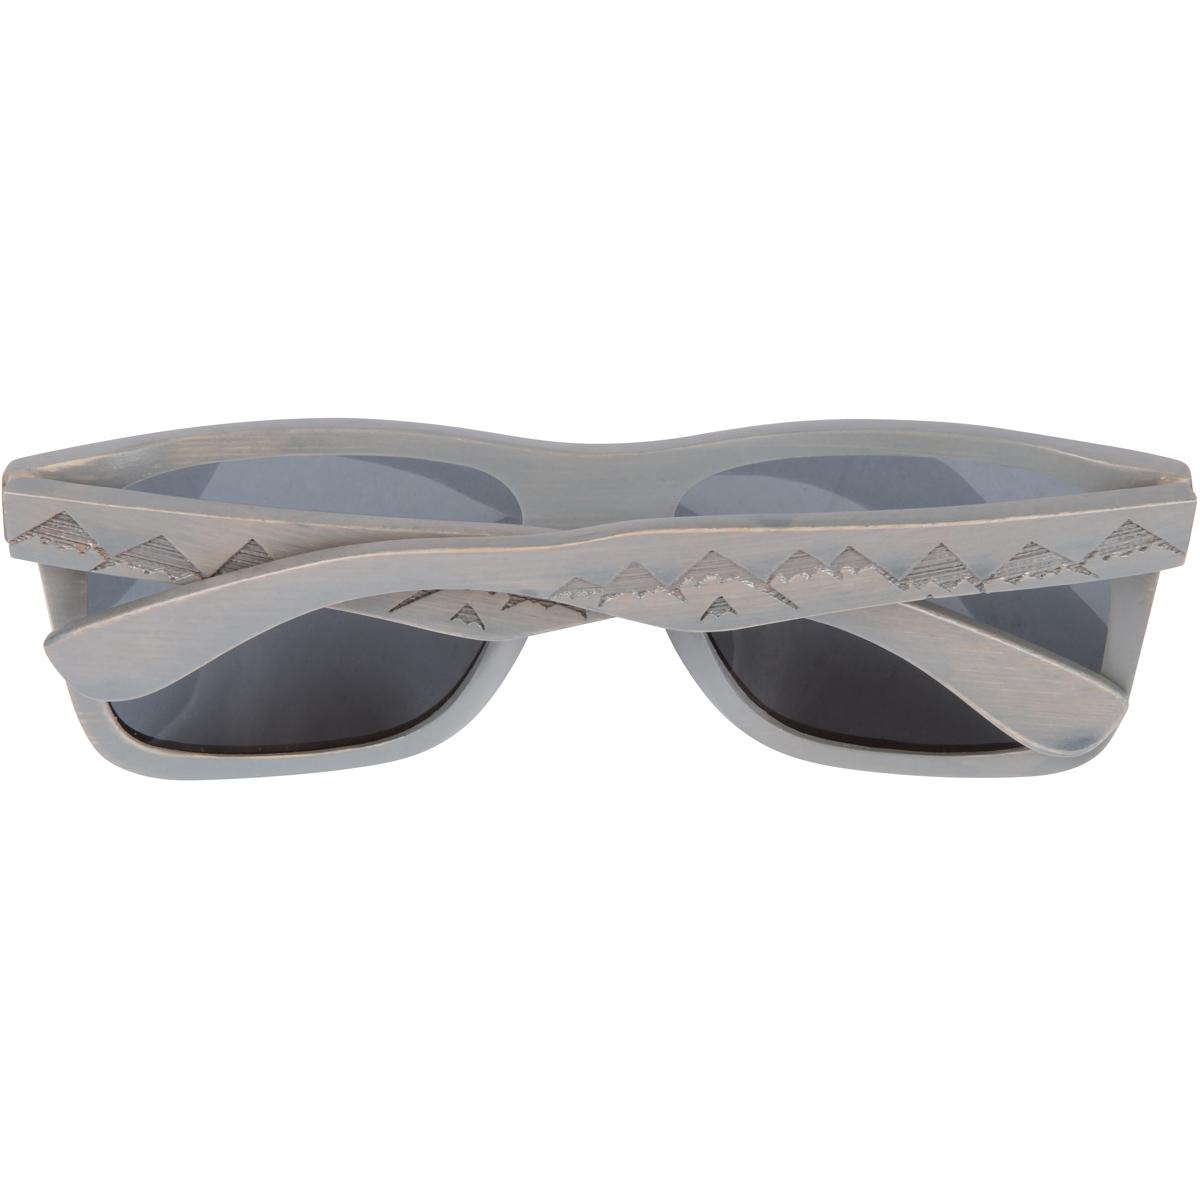 637c57d3bb Shiner Everest Sunglasses